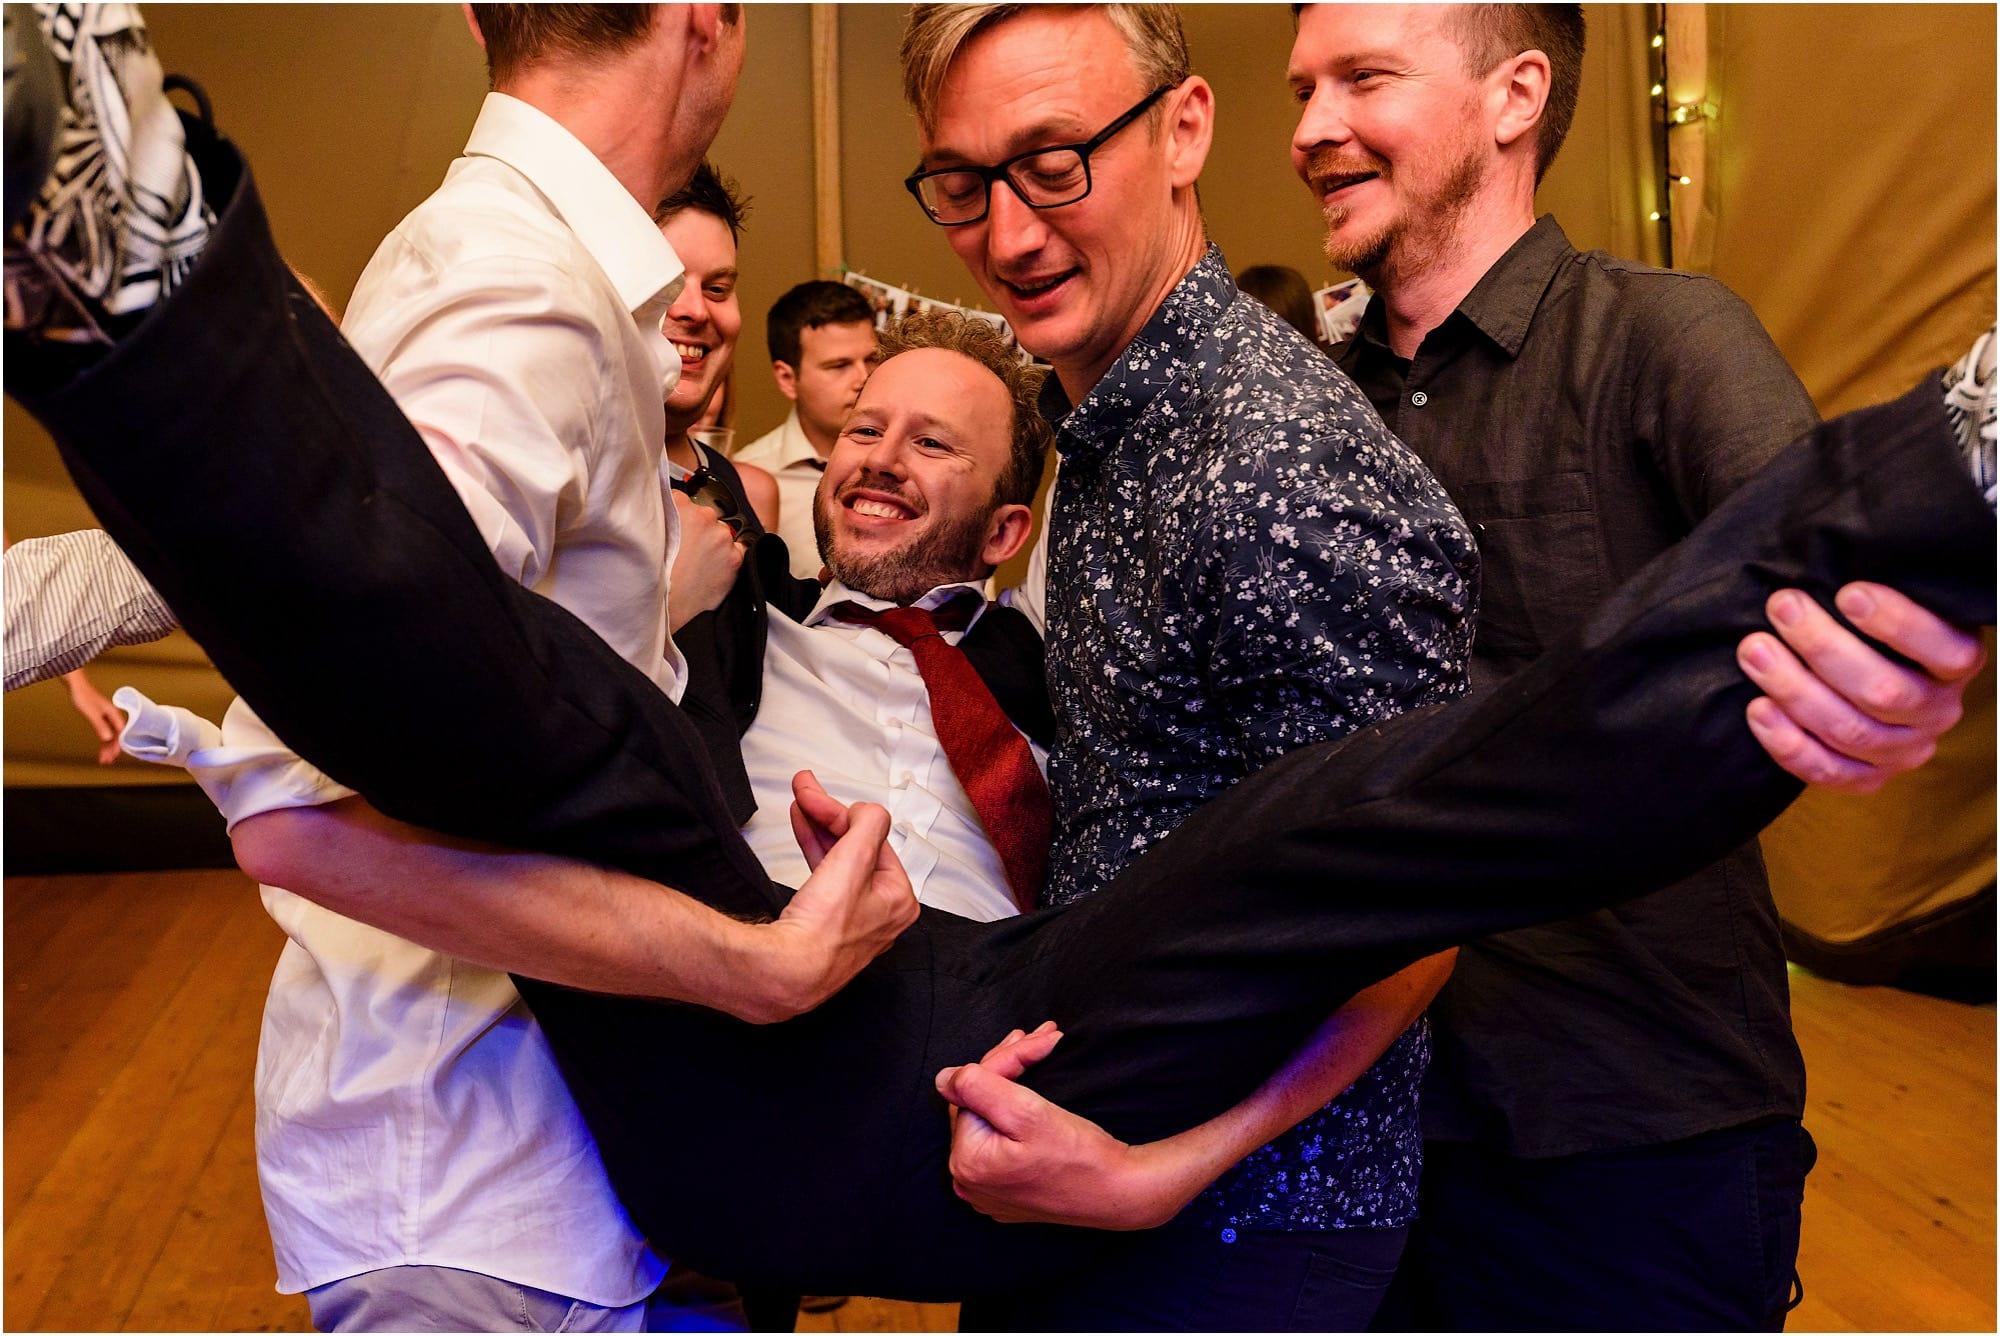 groom lifted again!